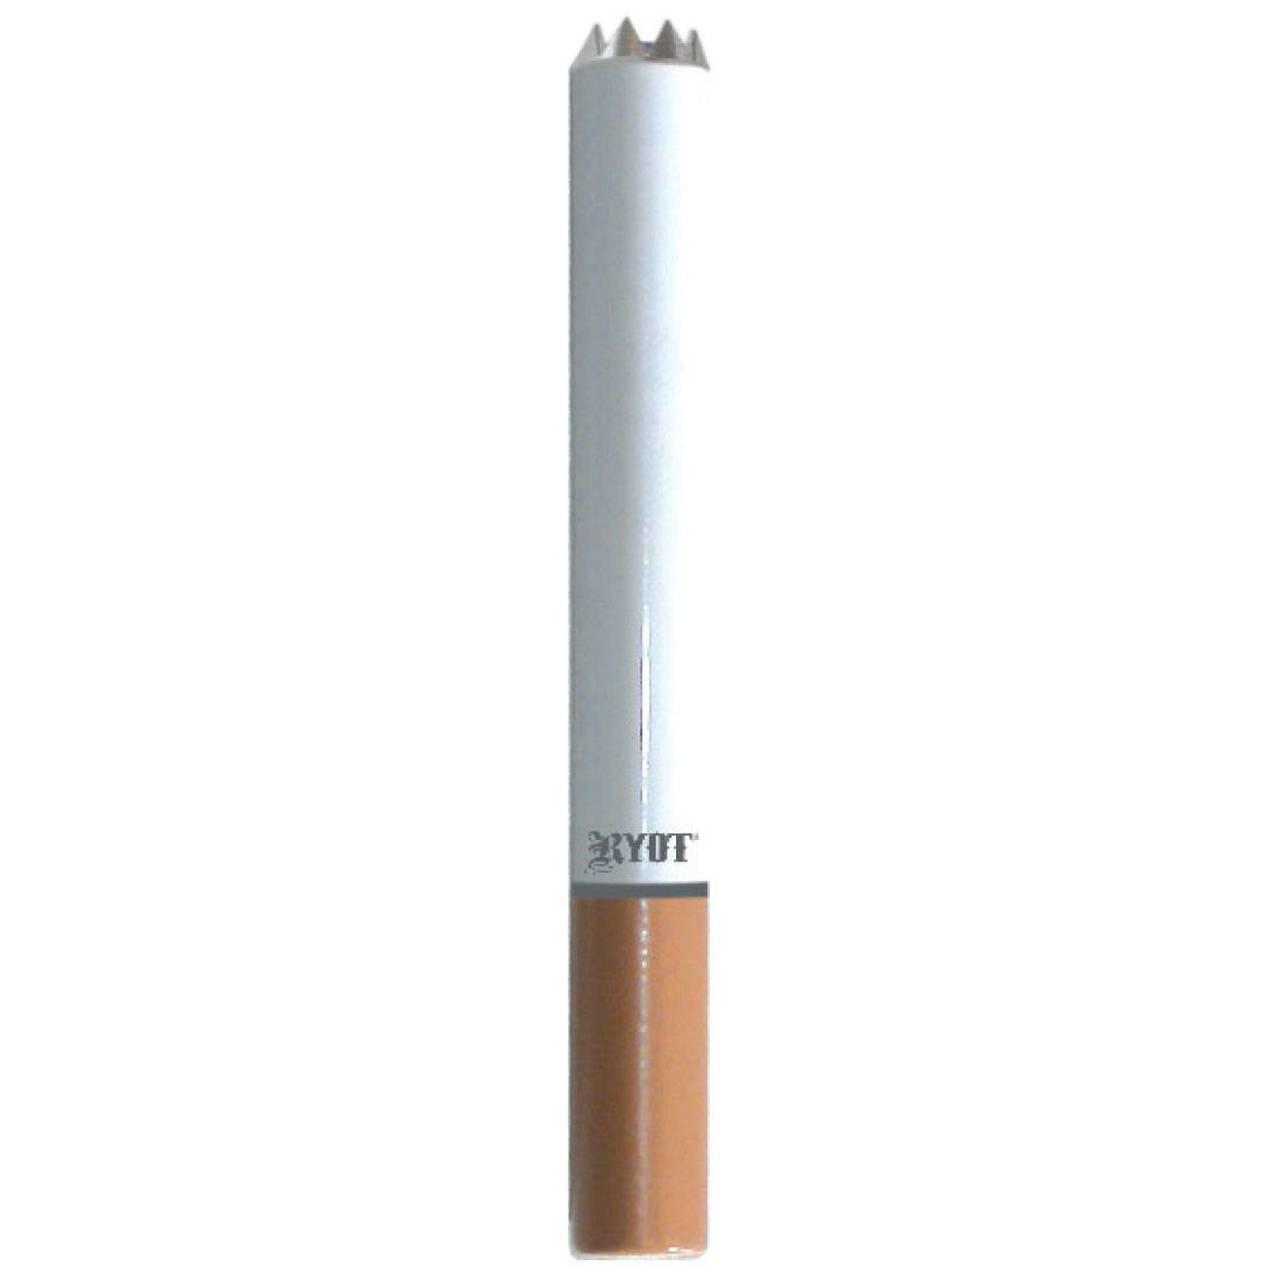 "Ryot Ryot Cigarette Bat 3"" One Hitter"